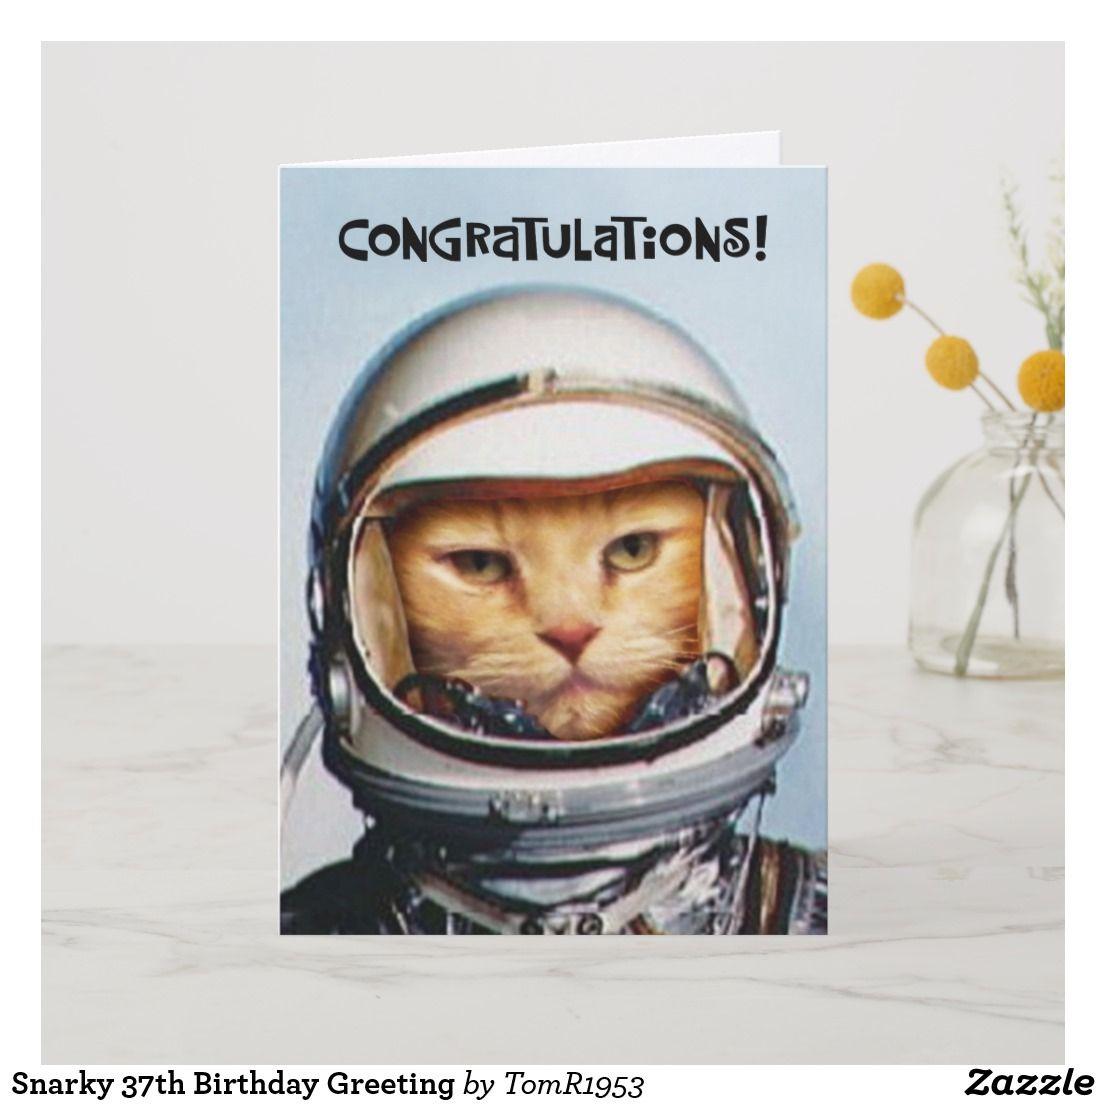 Snarky 37th Birthday Greeting Card Cardsfunny Cardsgreeting Cardshappy Cardbirthday Cardsonline Cards